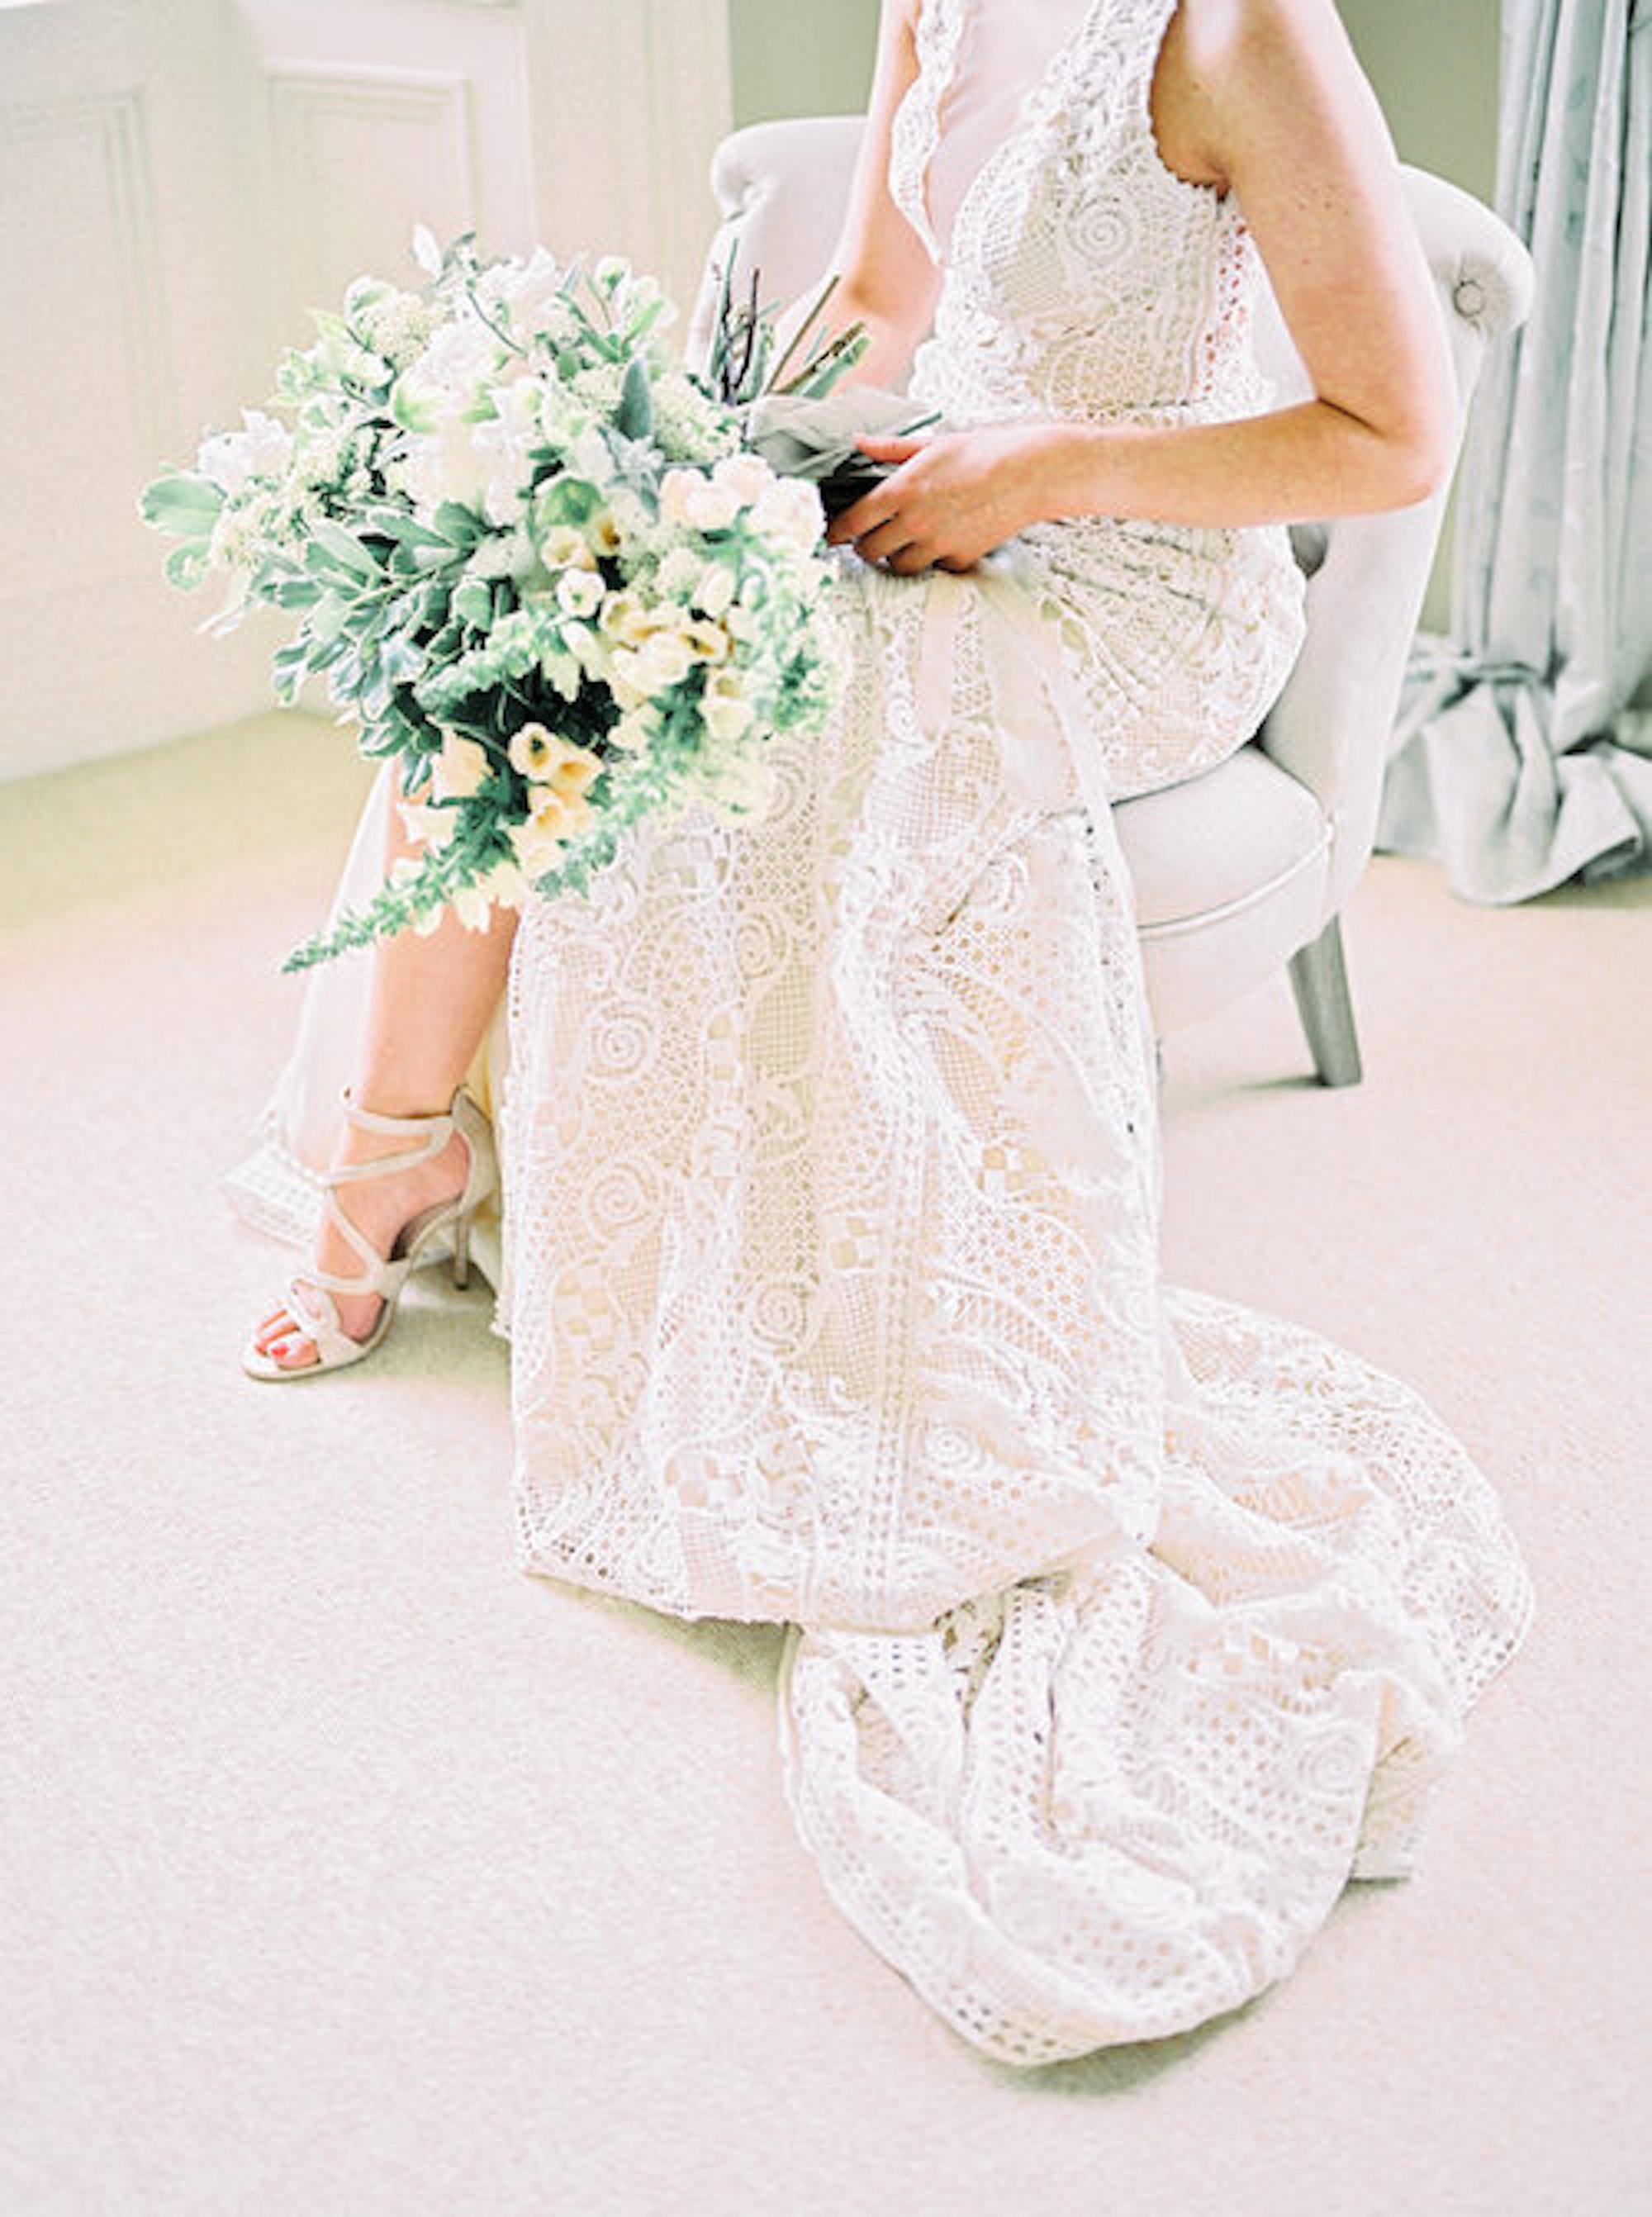 Luxury+Wedding+Planner+UK+_+A+Serene+&+Feminine+English+Country+House+Wedding+_+White+and+Silver+Toned+Green+Neutral+Tones+Rutland+_+Katie+Julia+Photography+Serene+Femininity+Image+4.jpg